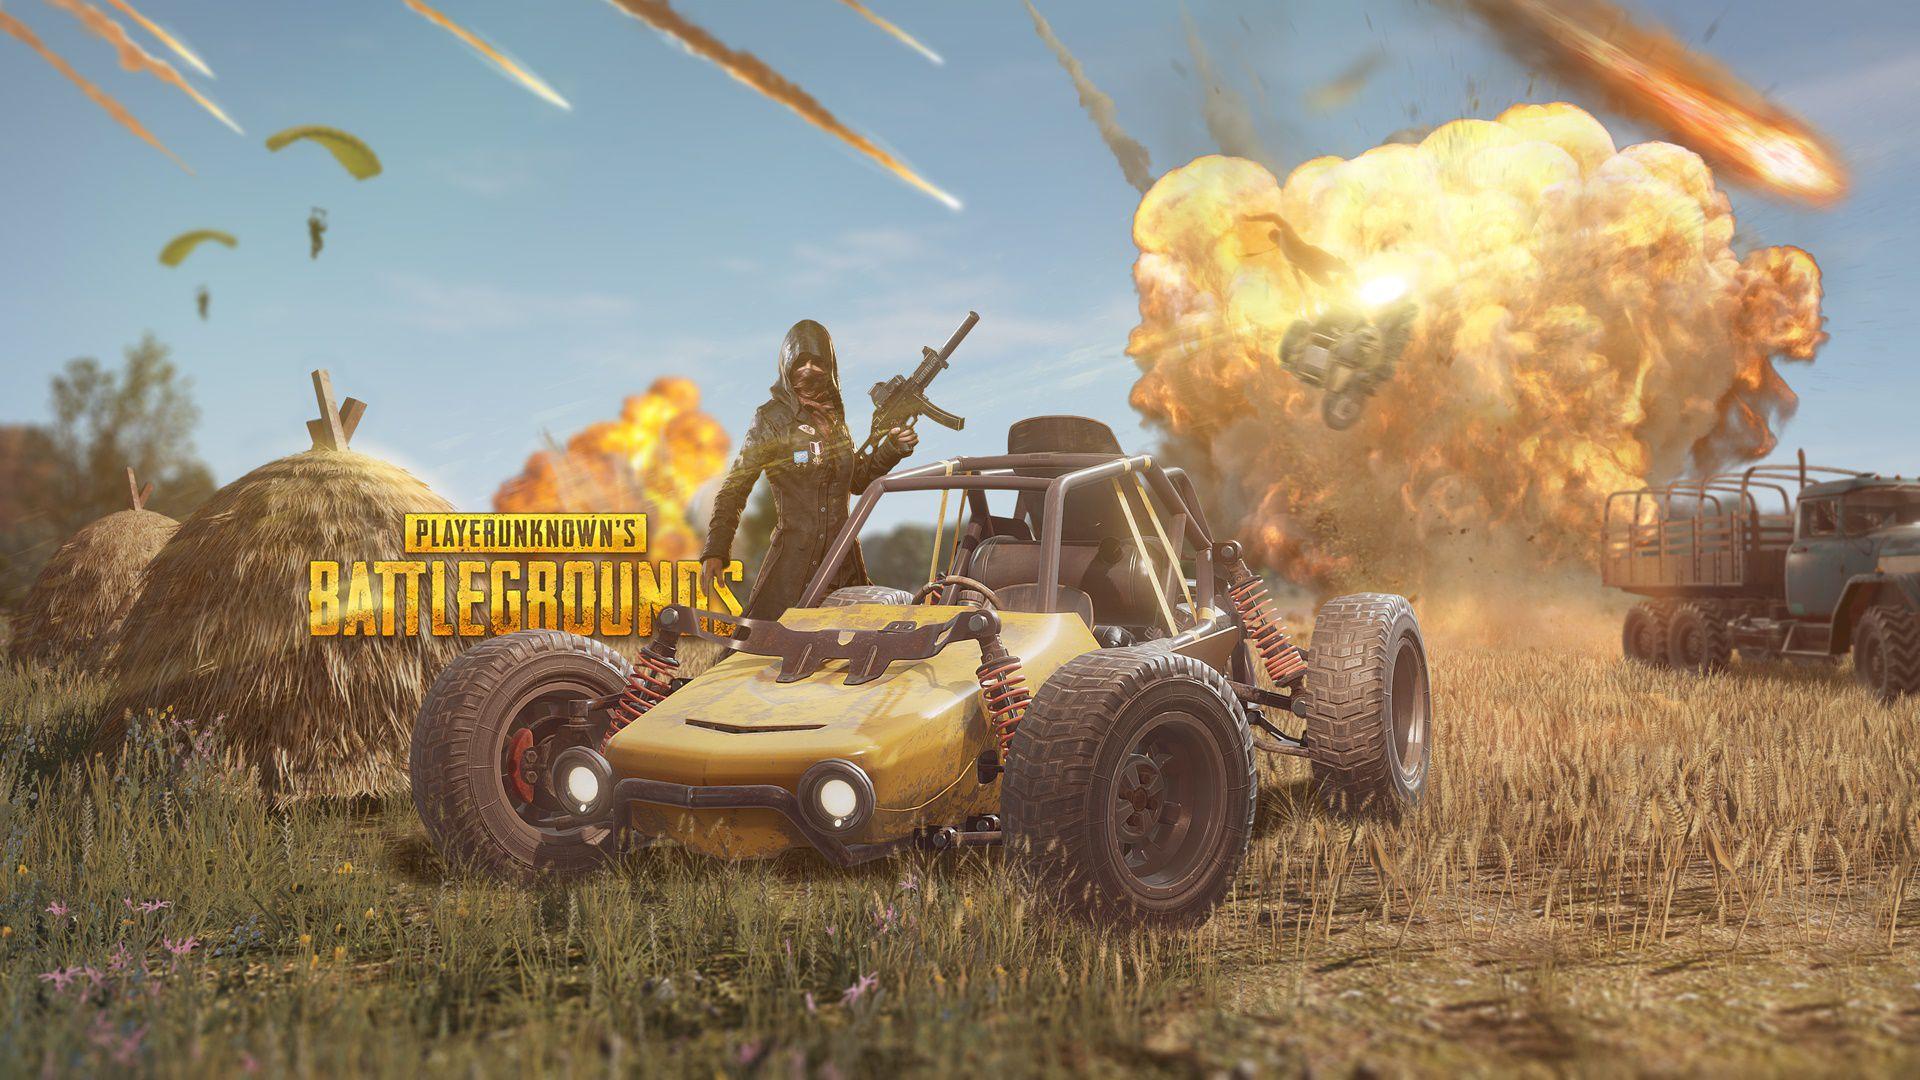 PlayerUnknowns Battlegrounds PUBG Wallpapers and Photos 1920x1080